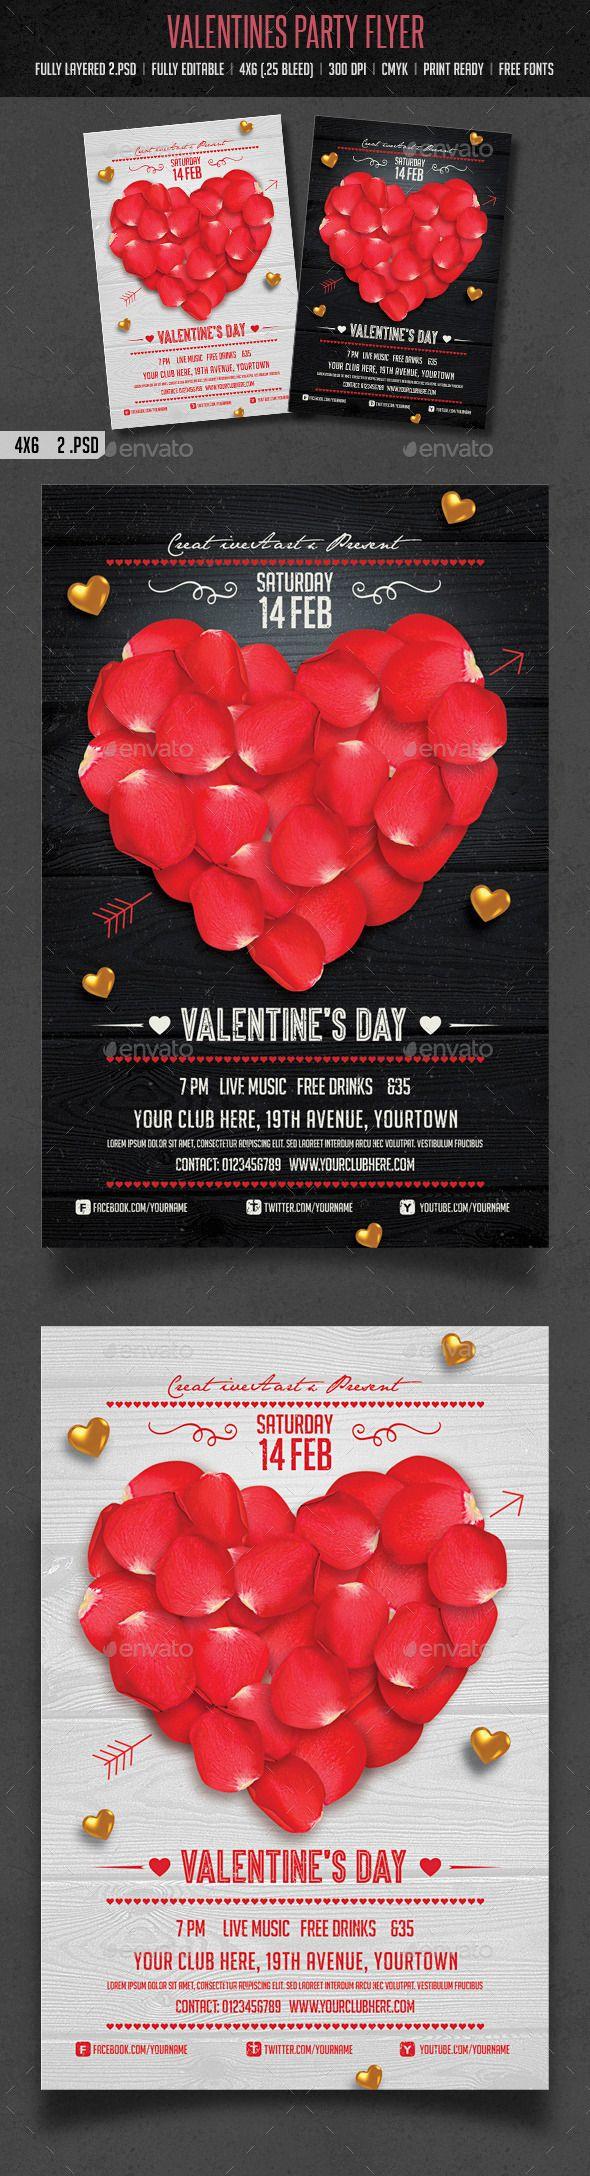 Valentines Day Flyer Template #design Download: http://graphicriver.net/item/valentines-day-flyer/10017695?ref=ksioks